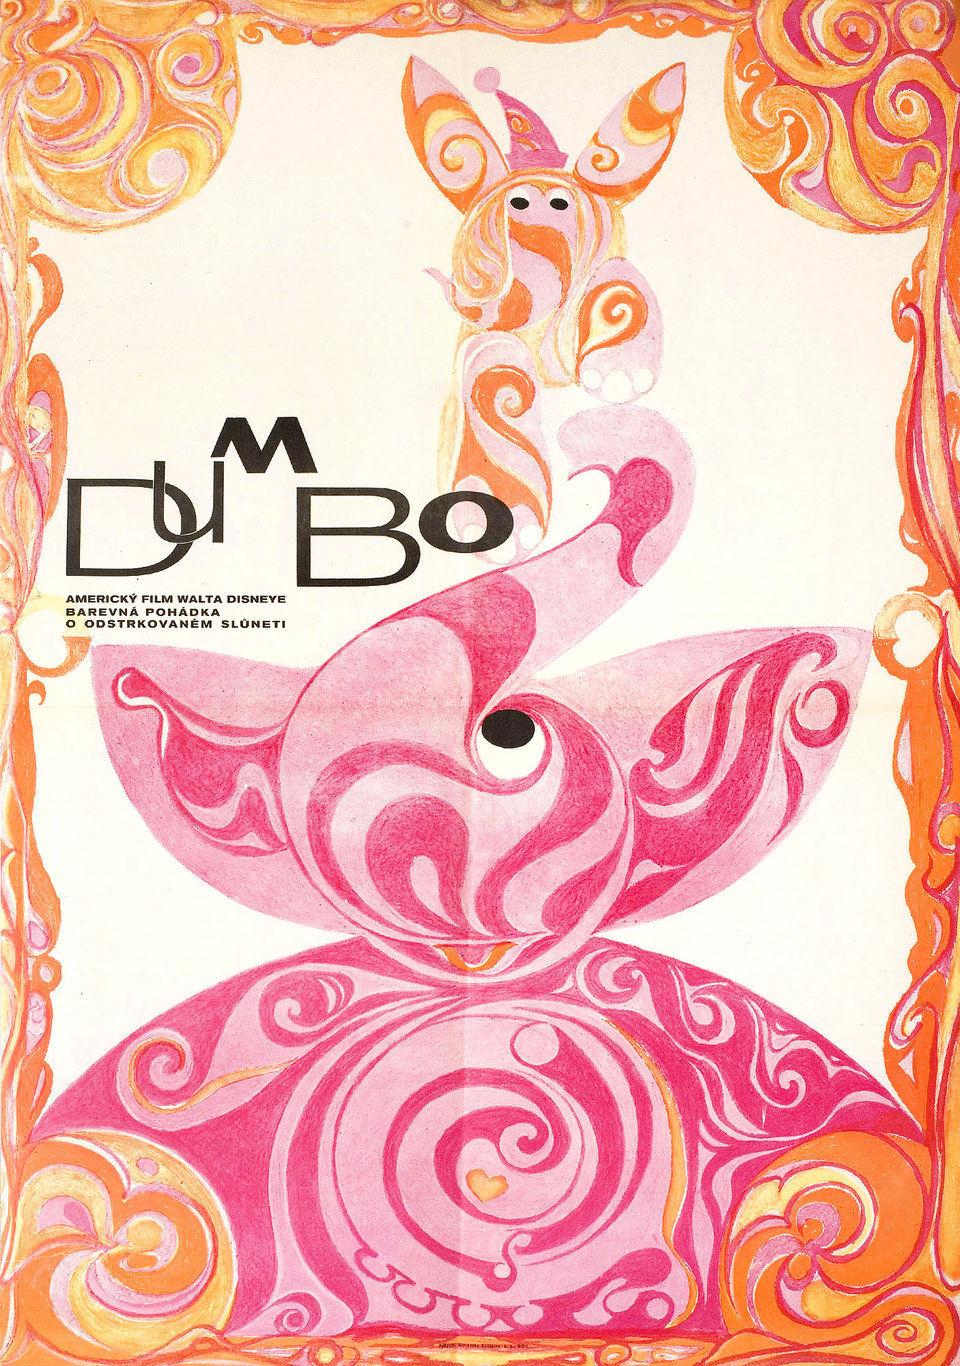 dumbo-1960s-original-czech-republic-movie-poster